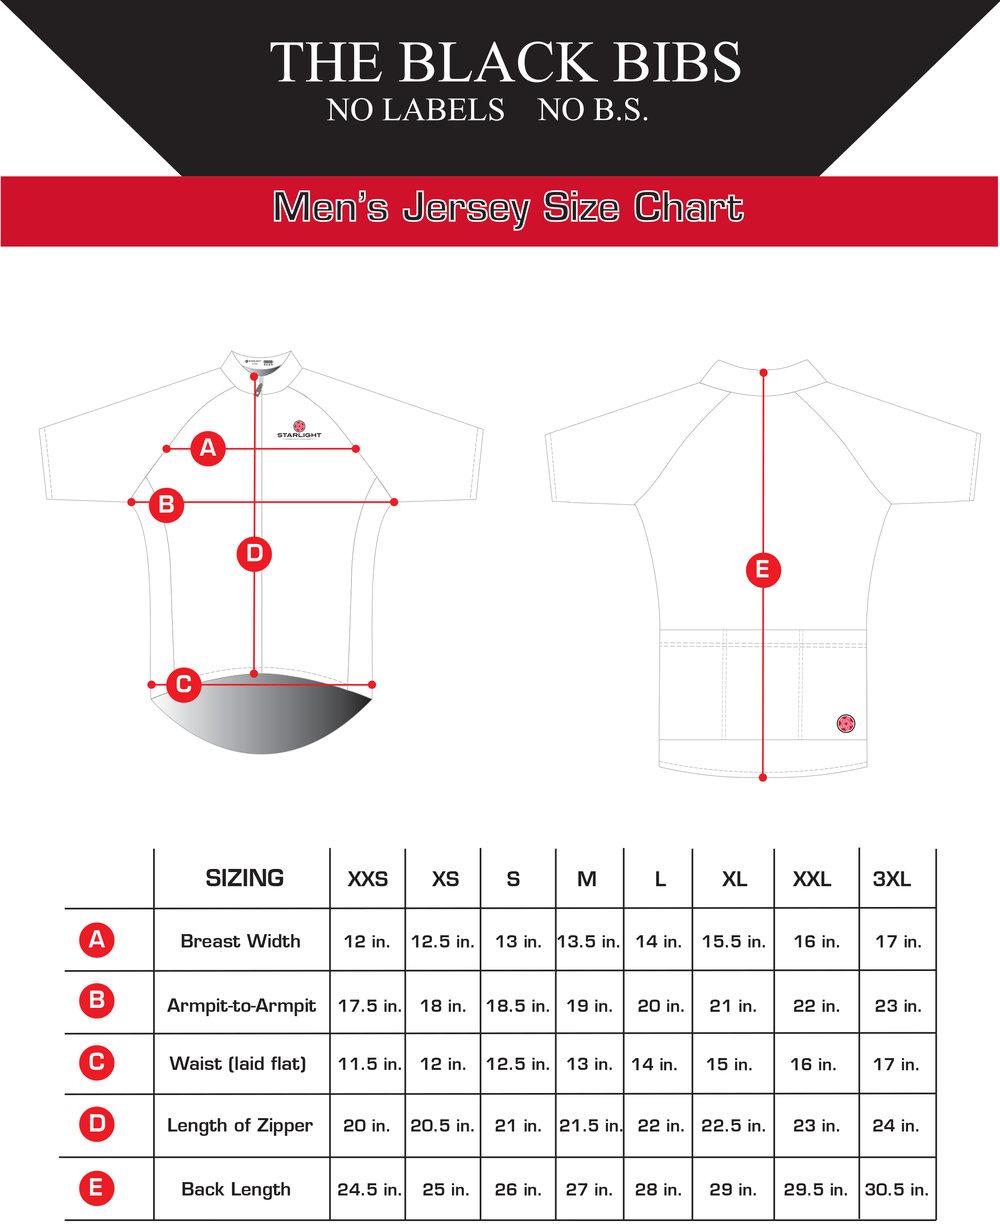 Men's Jersey Size Chart.jpg